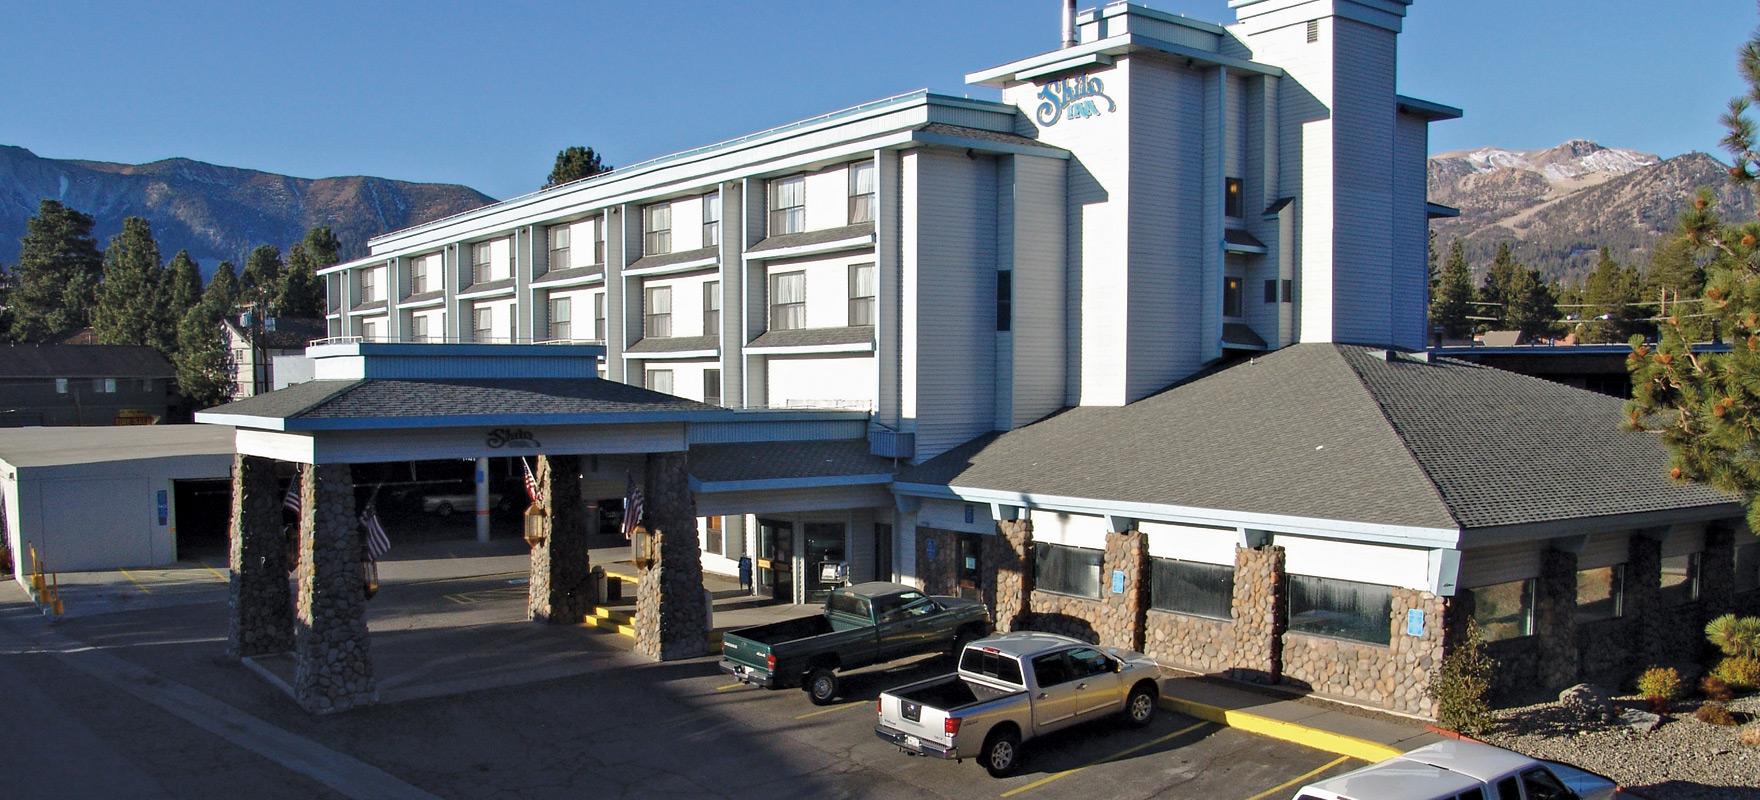 Shilo Inns Suites Hotels - bwin apuestas Medford bwin werbung bwin Live-Fußballergebnisse | Oregon